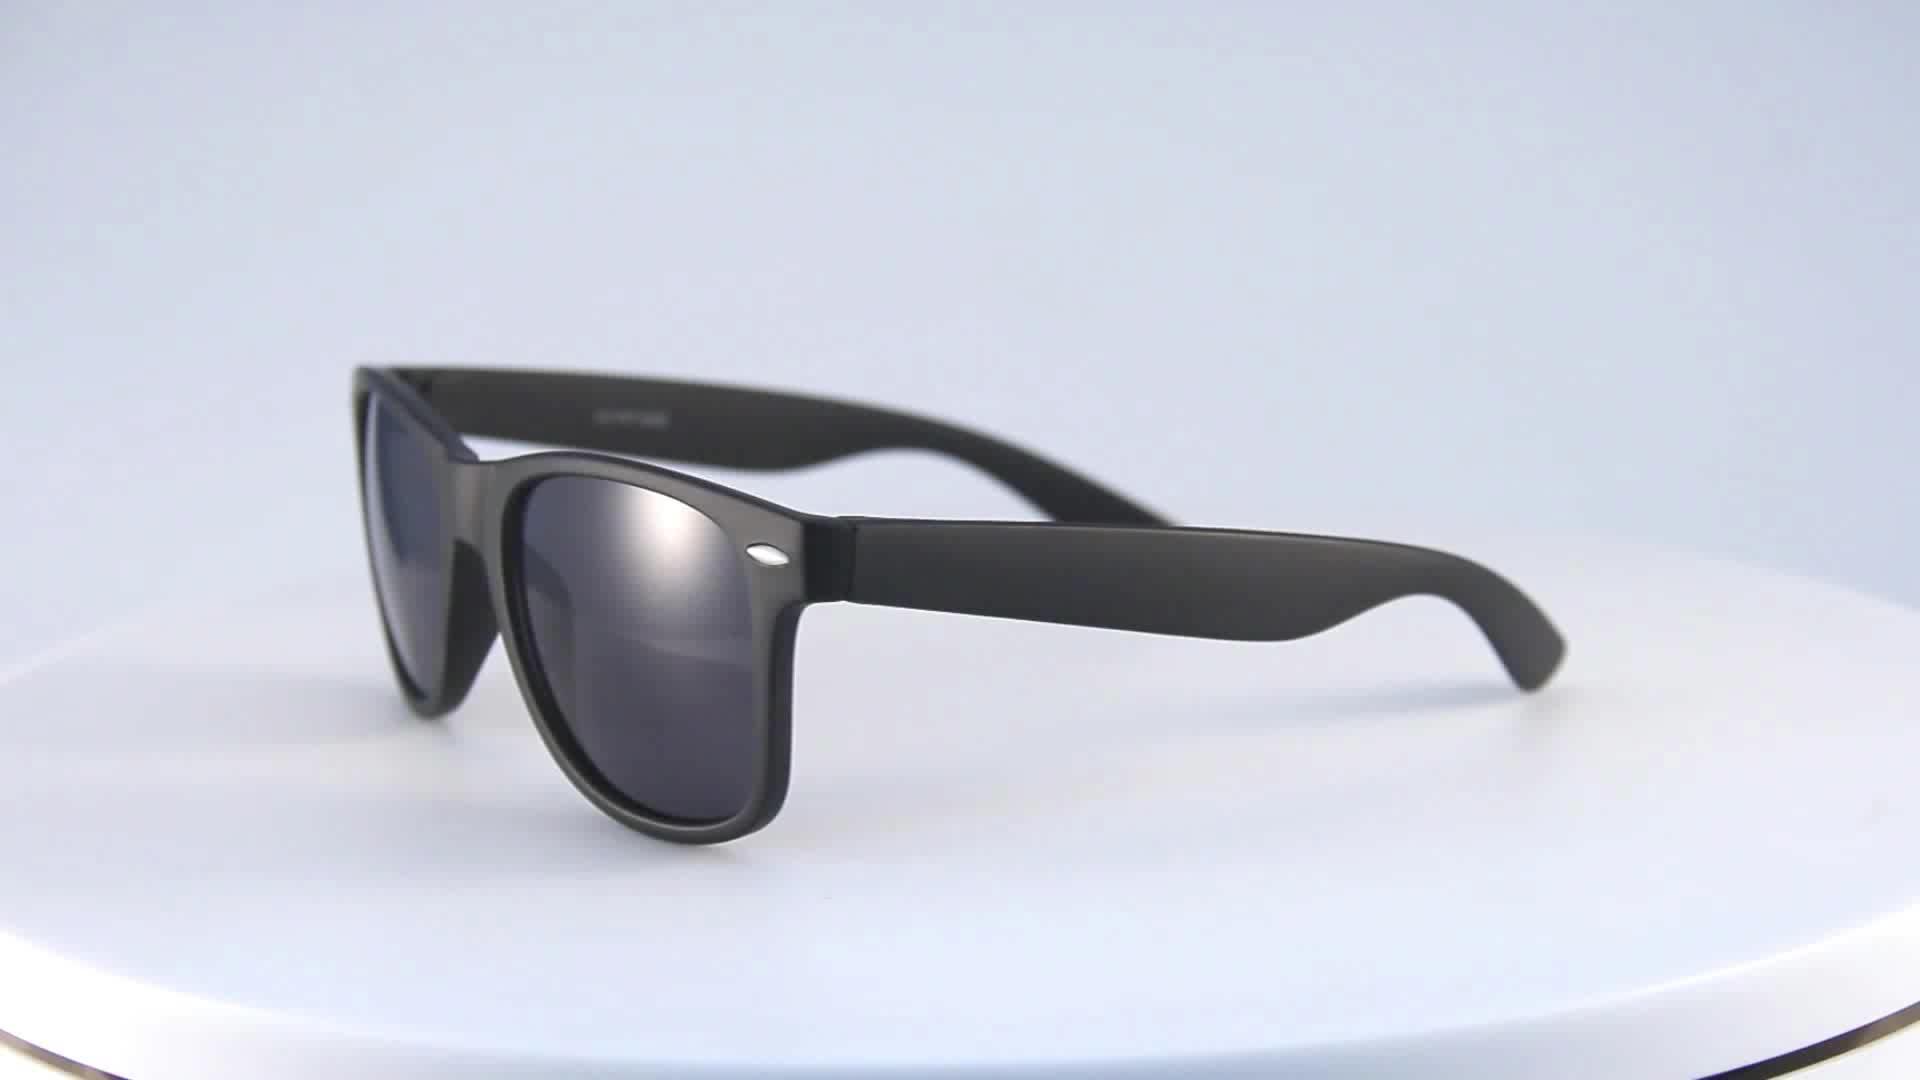 Hot selling unisex promotional sunglasses high quality cheap plastic sunglasses 2020